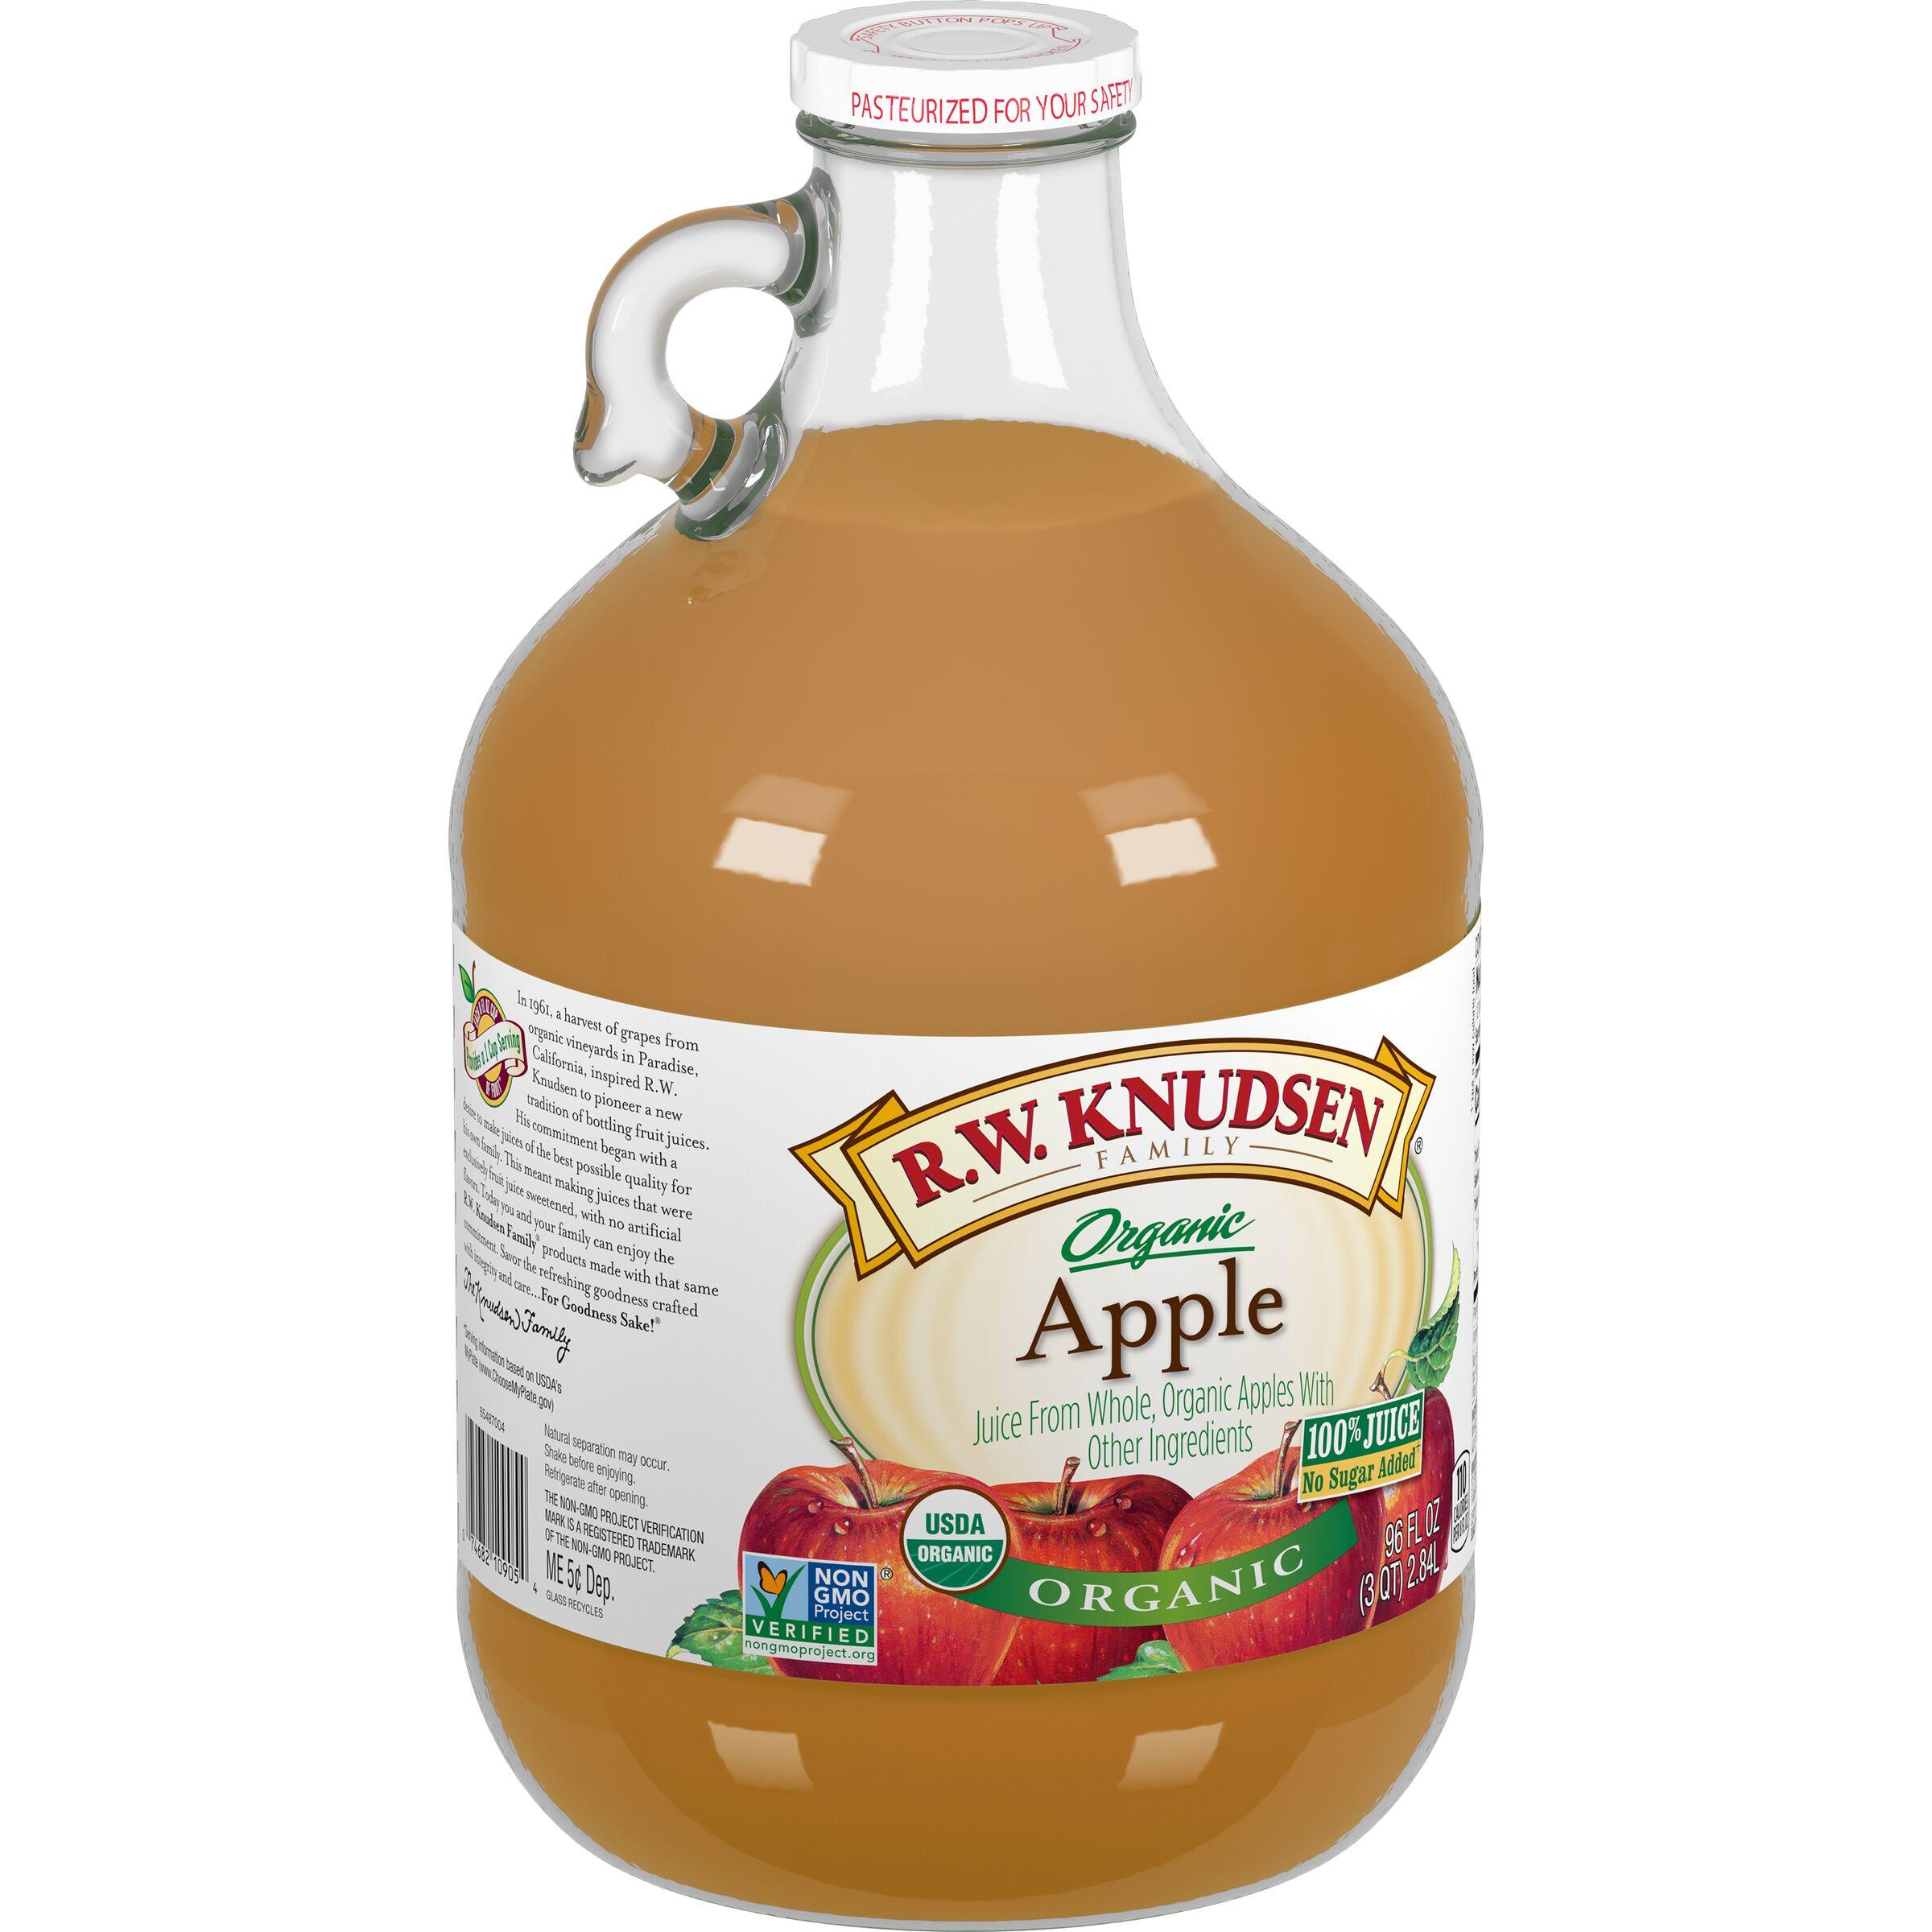 R.W. Knudsen Family  Organic Apple Juice Box